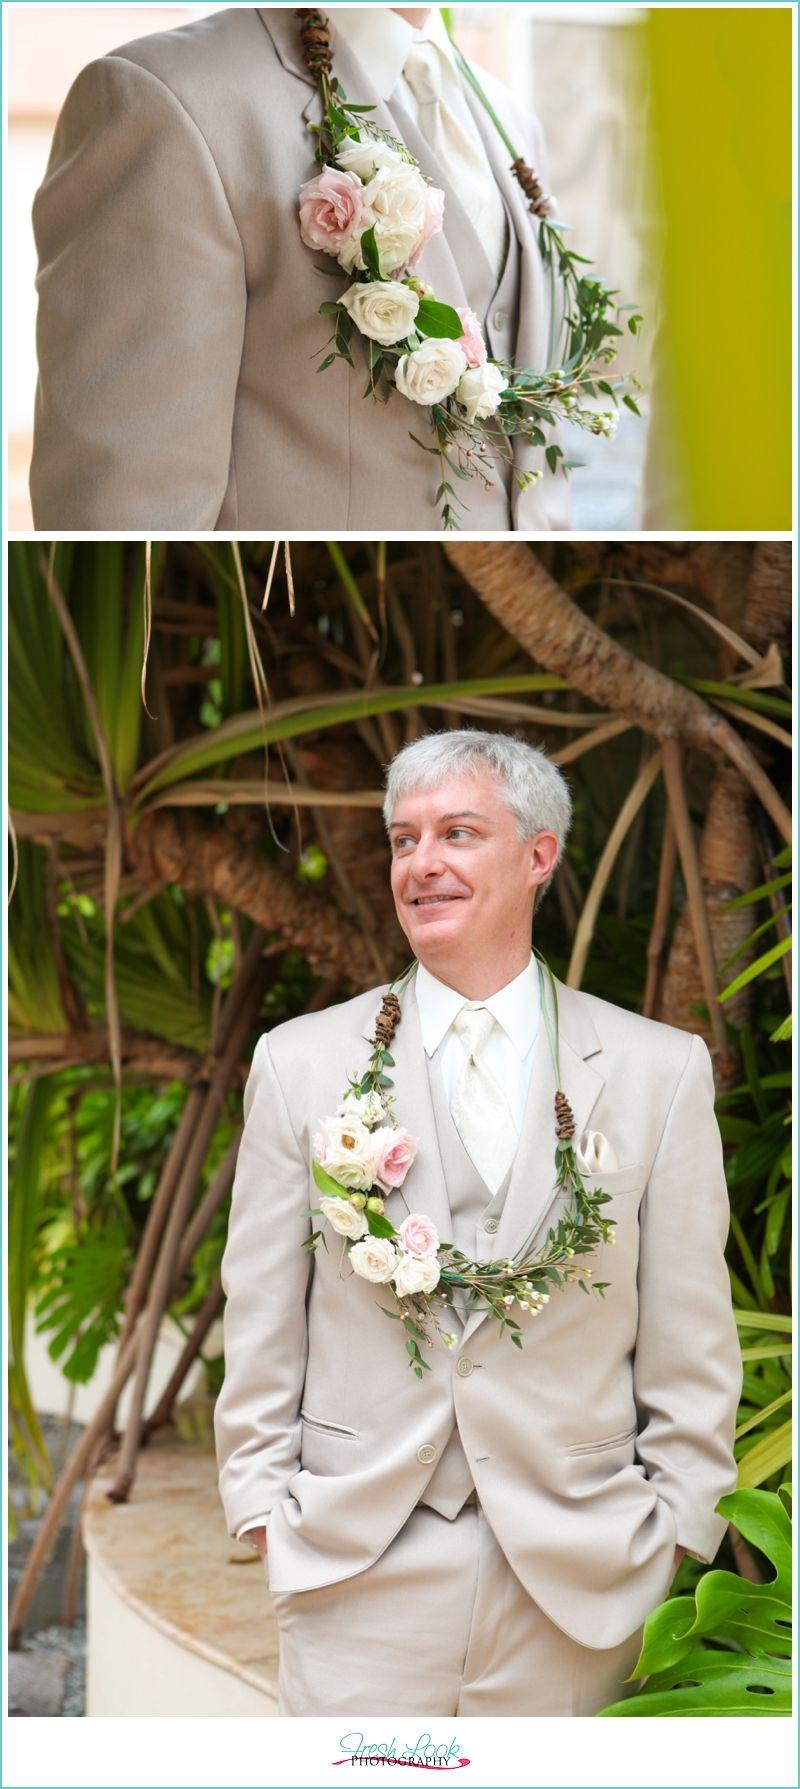 Vintage Hawaiian Wedding Mr And Mrs Fresh Look Photography Honolulu Married In Hawaii Downtown Abby Themed Ku U Lei Groom